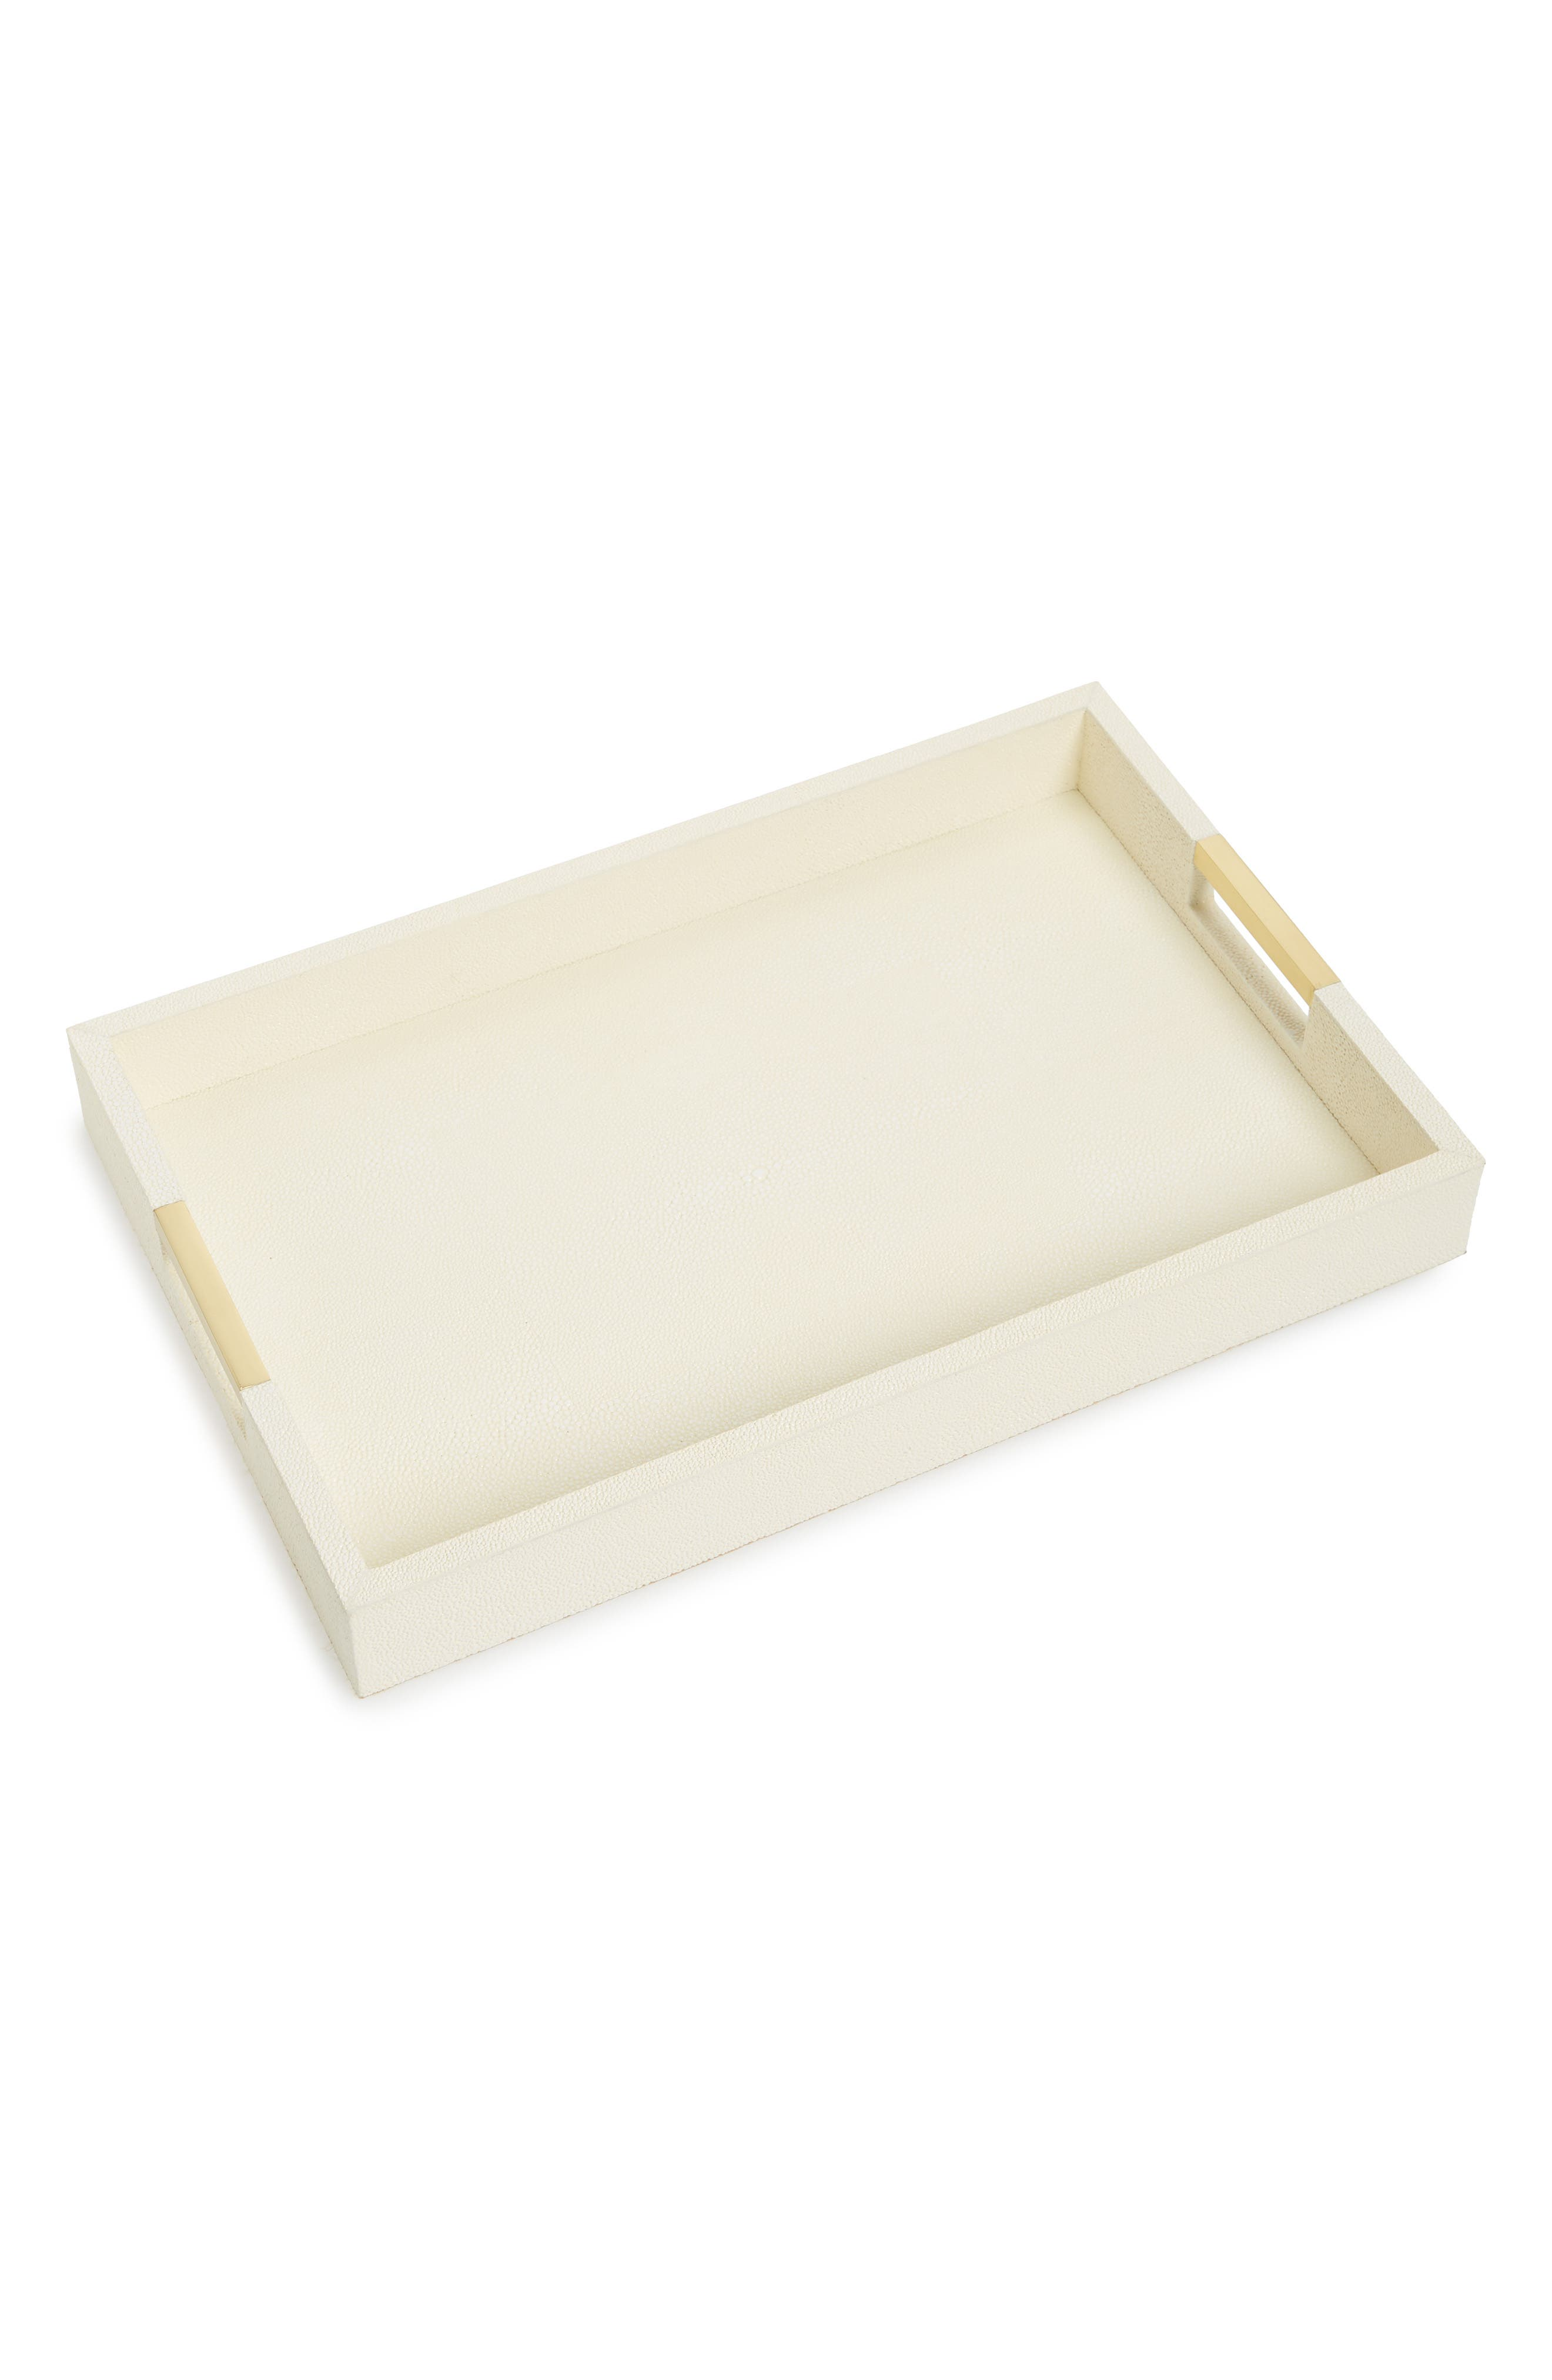 Modern Shagreen Desk Tray,                         Main,                         color, Ivory Cream